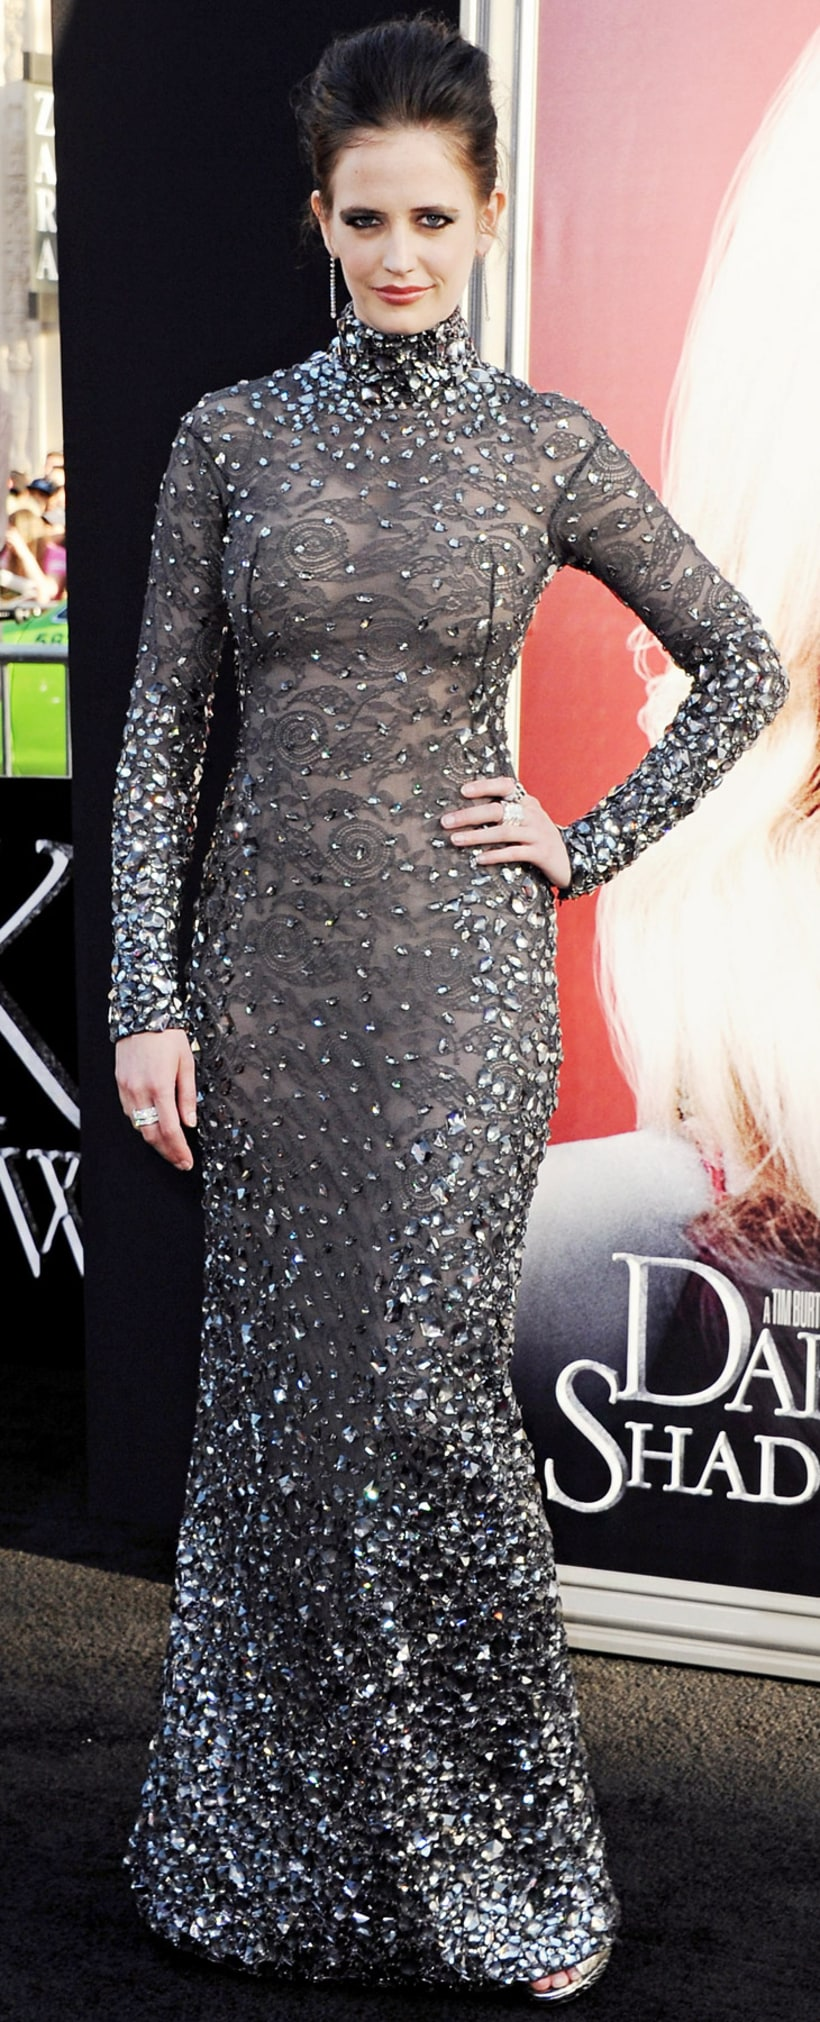 Eva Green: Dark Shadows Premiere | Red Carpet 24/7: What ...